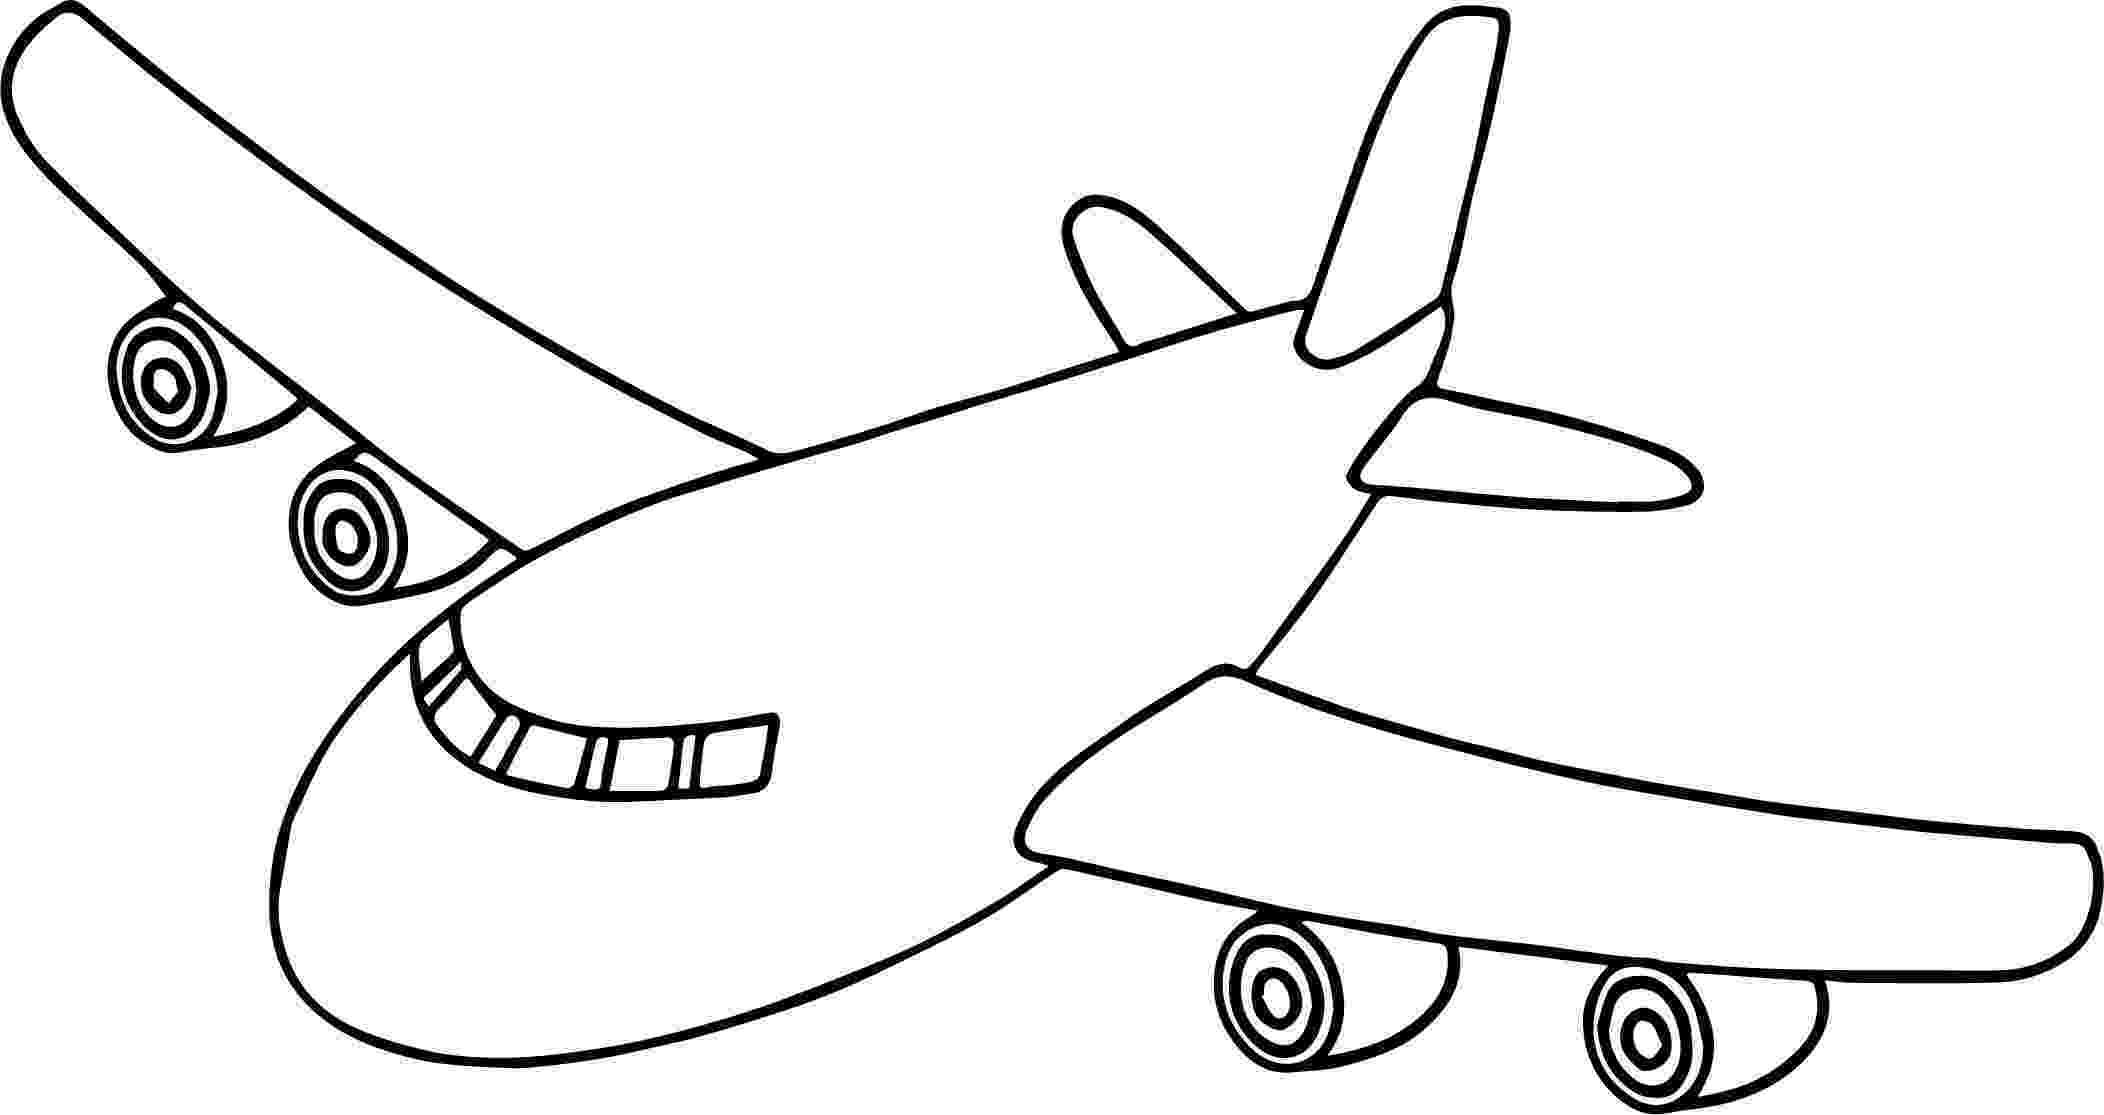 planes printable coloring pages free printable airplane coloring pages for kids pages planes coloring printable